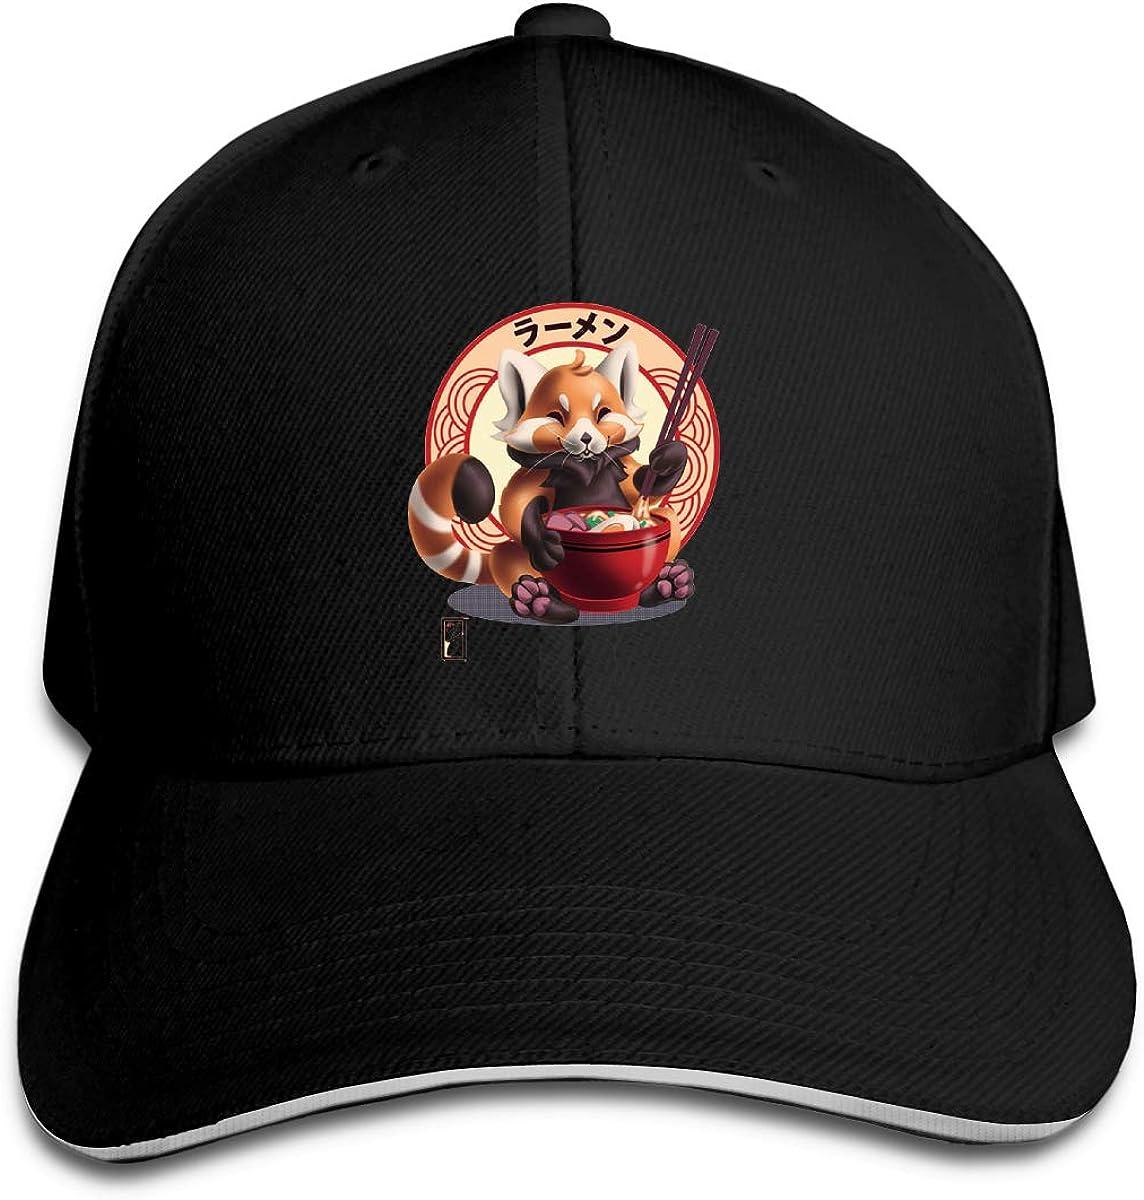 Red Panda Noms Classic Adjustable Cotton Baseball Caps Trucker Driver Hat Outdoor Cap Black